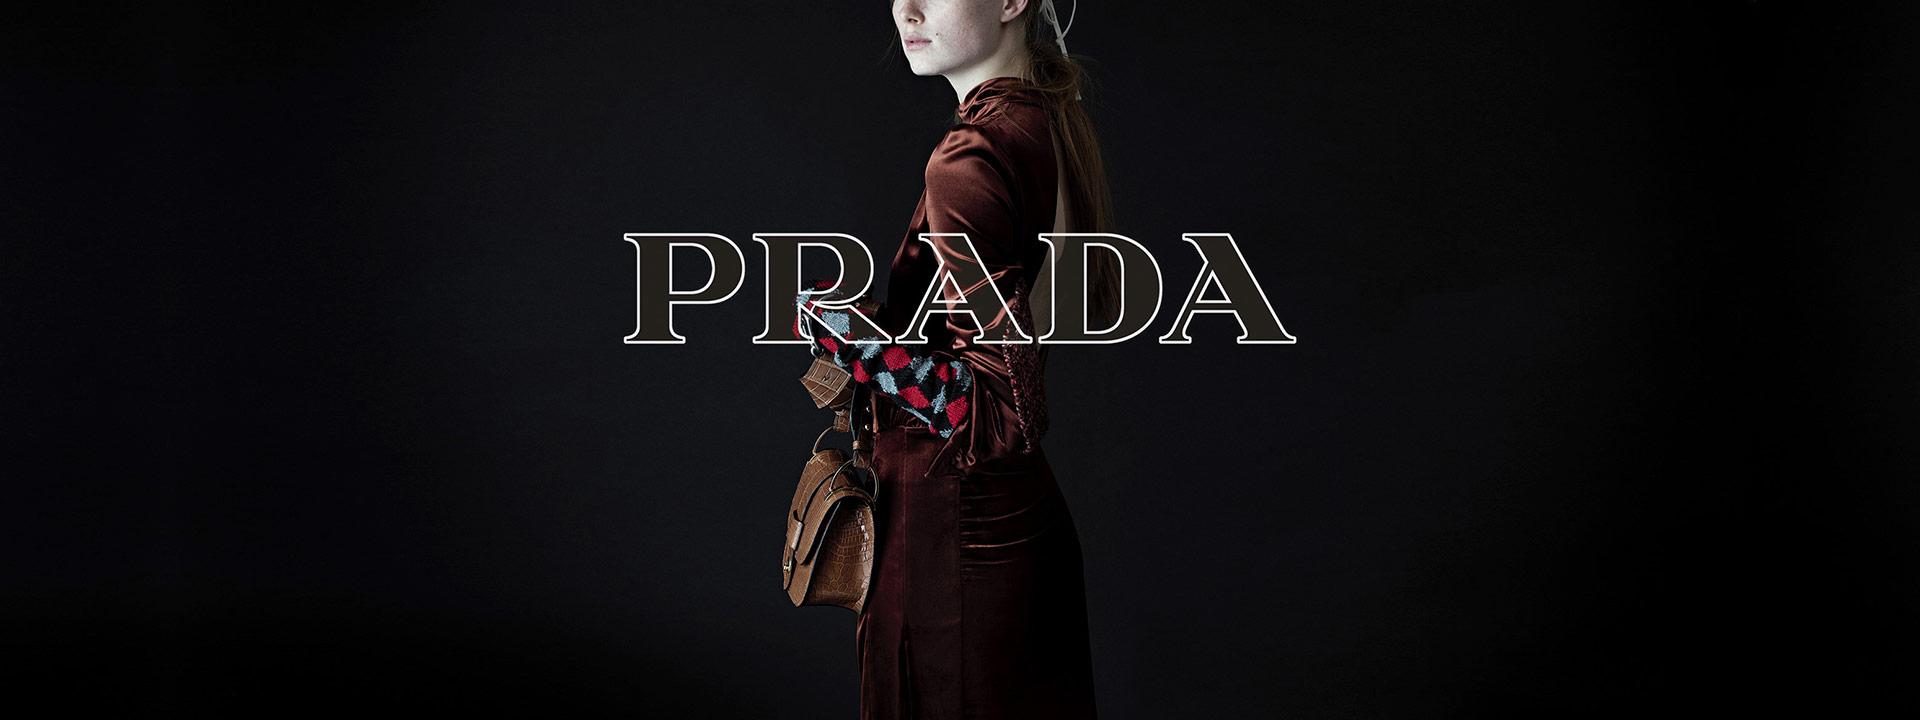 prada banner - پرادا | Prada